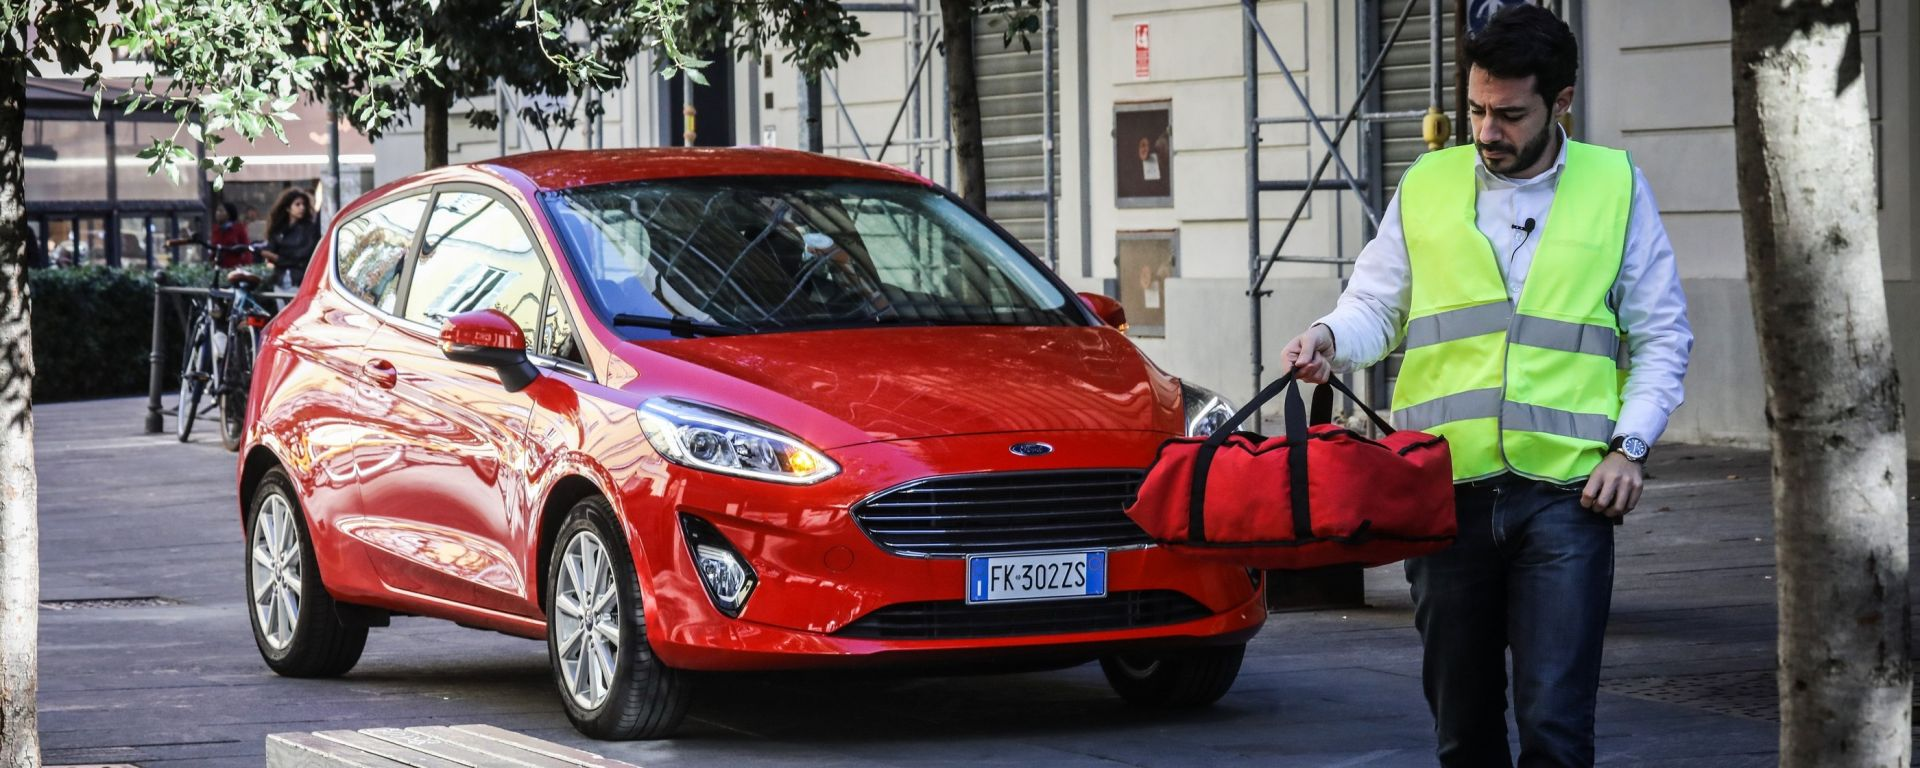 Nuova Ford Fiesta: c'è pizza per te